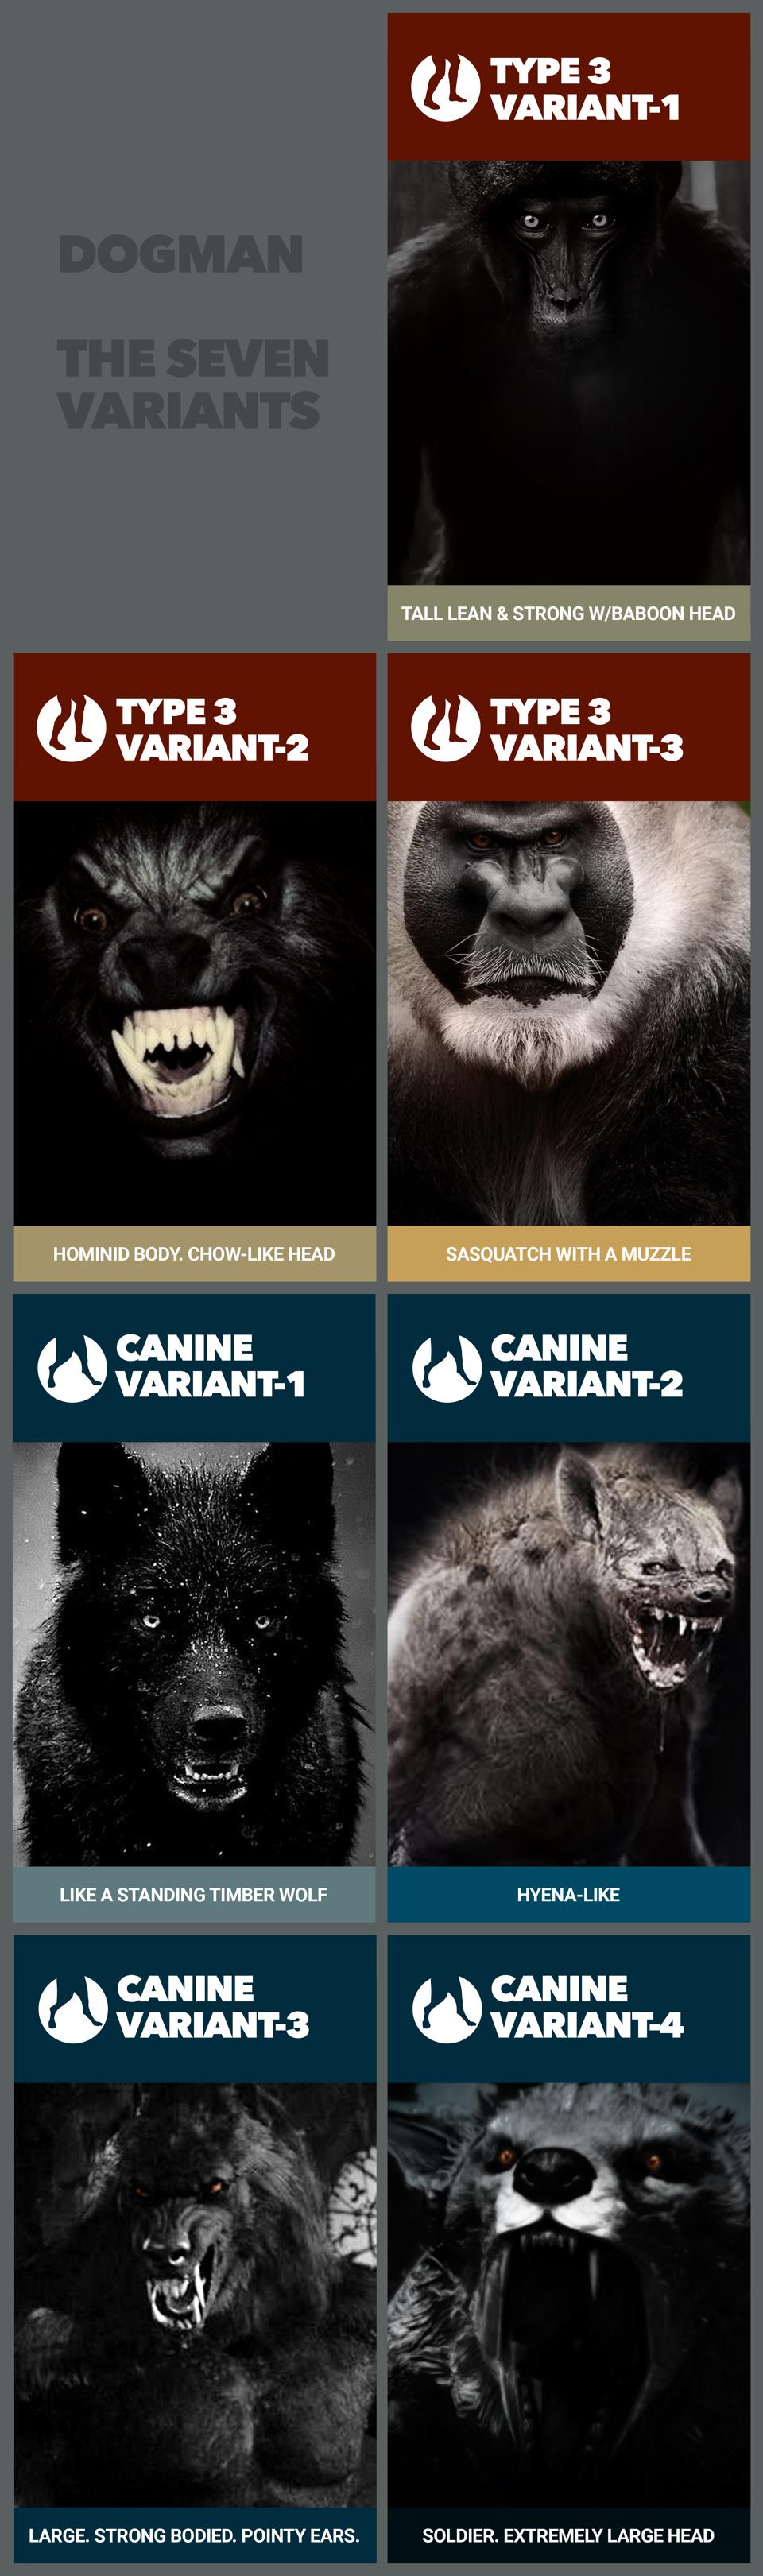 7 Types of Dogman